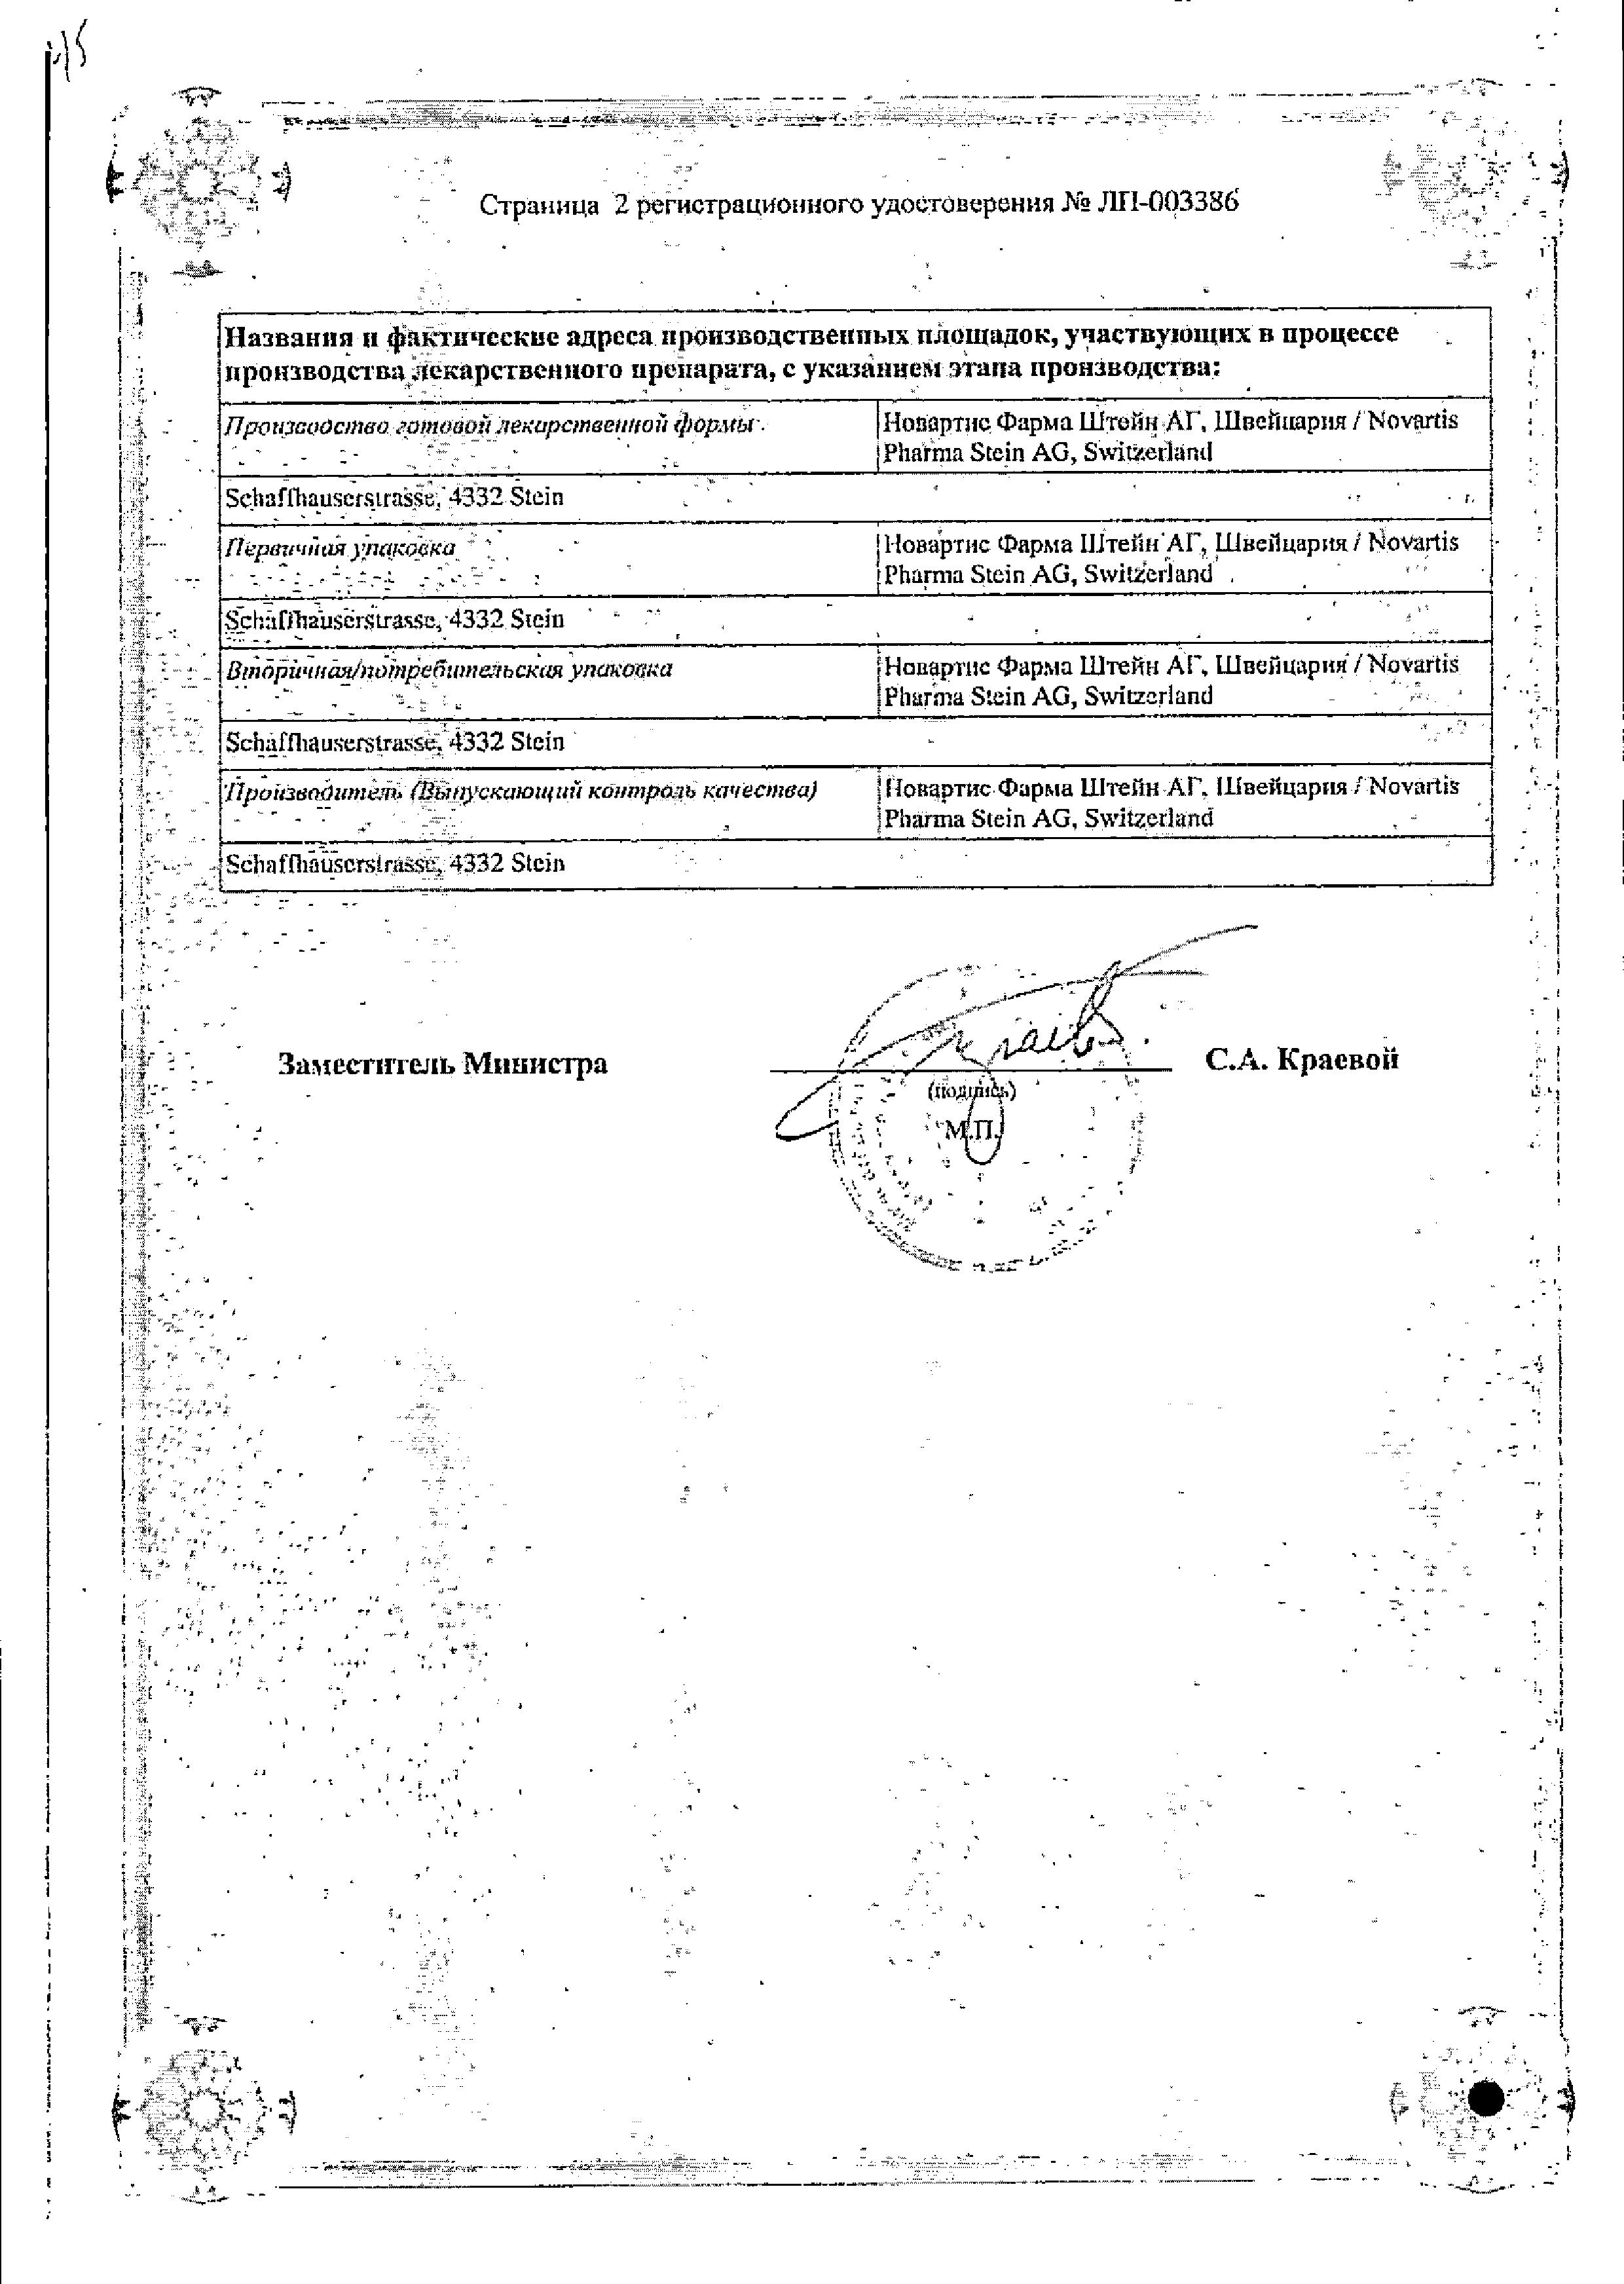 Ультибро Бризхалер сертификат